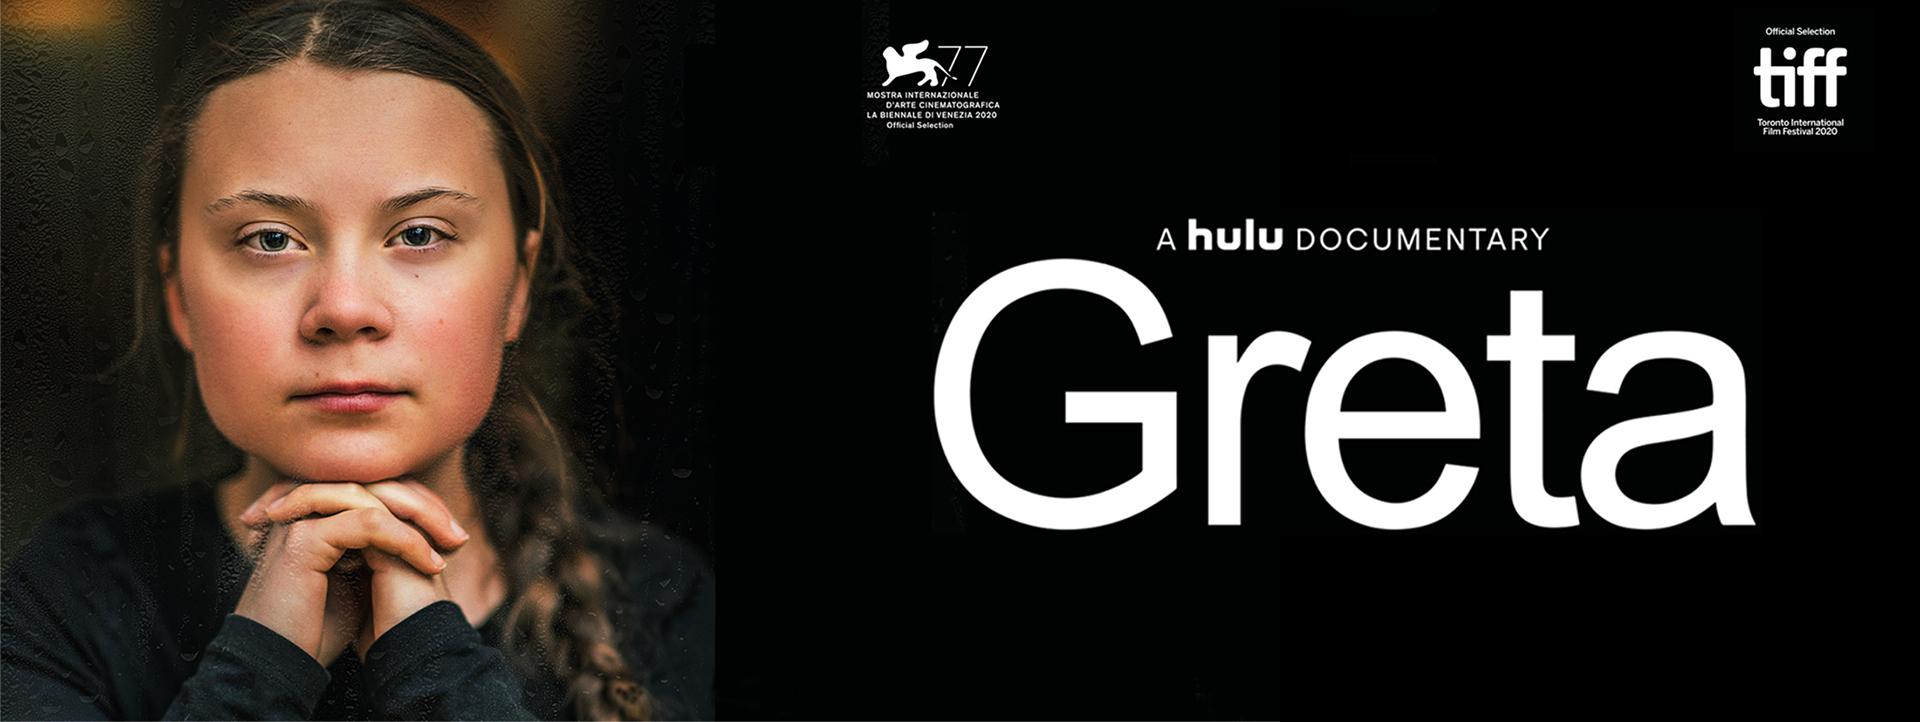 Greta documentary film